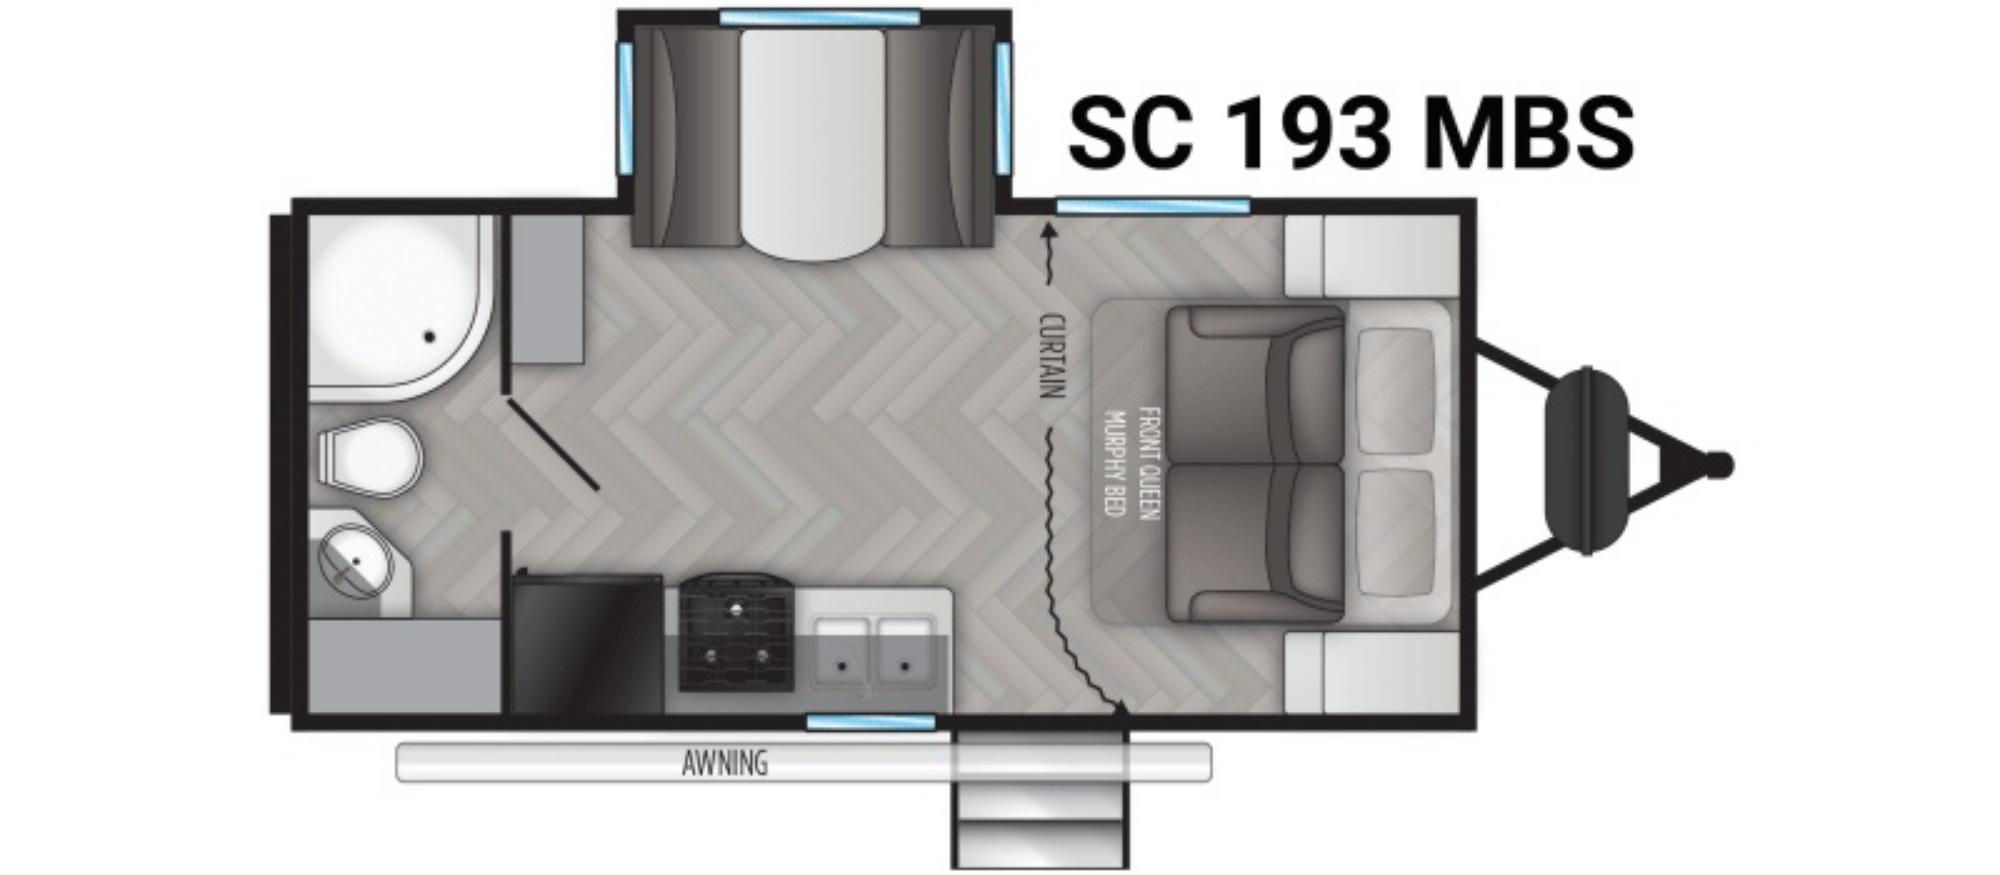 View Floor Plan for 2022 CRUISER RV SHADOW CRUISER ID193MBS